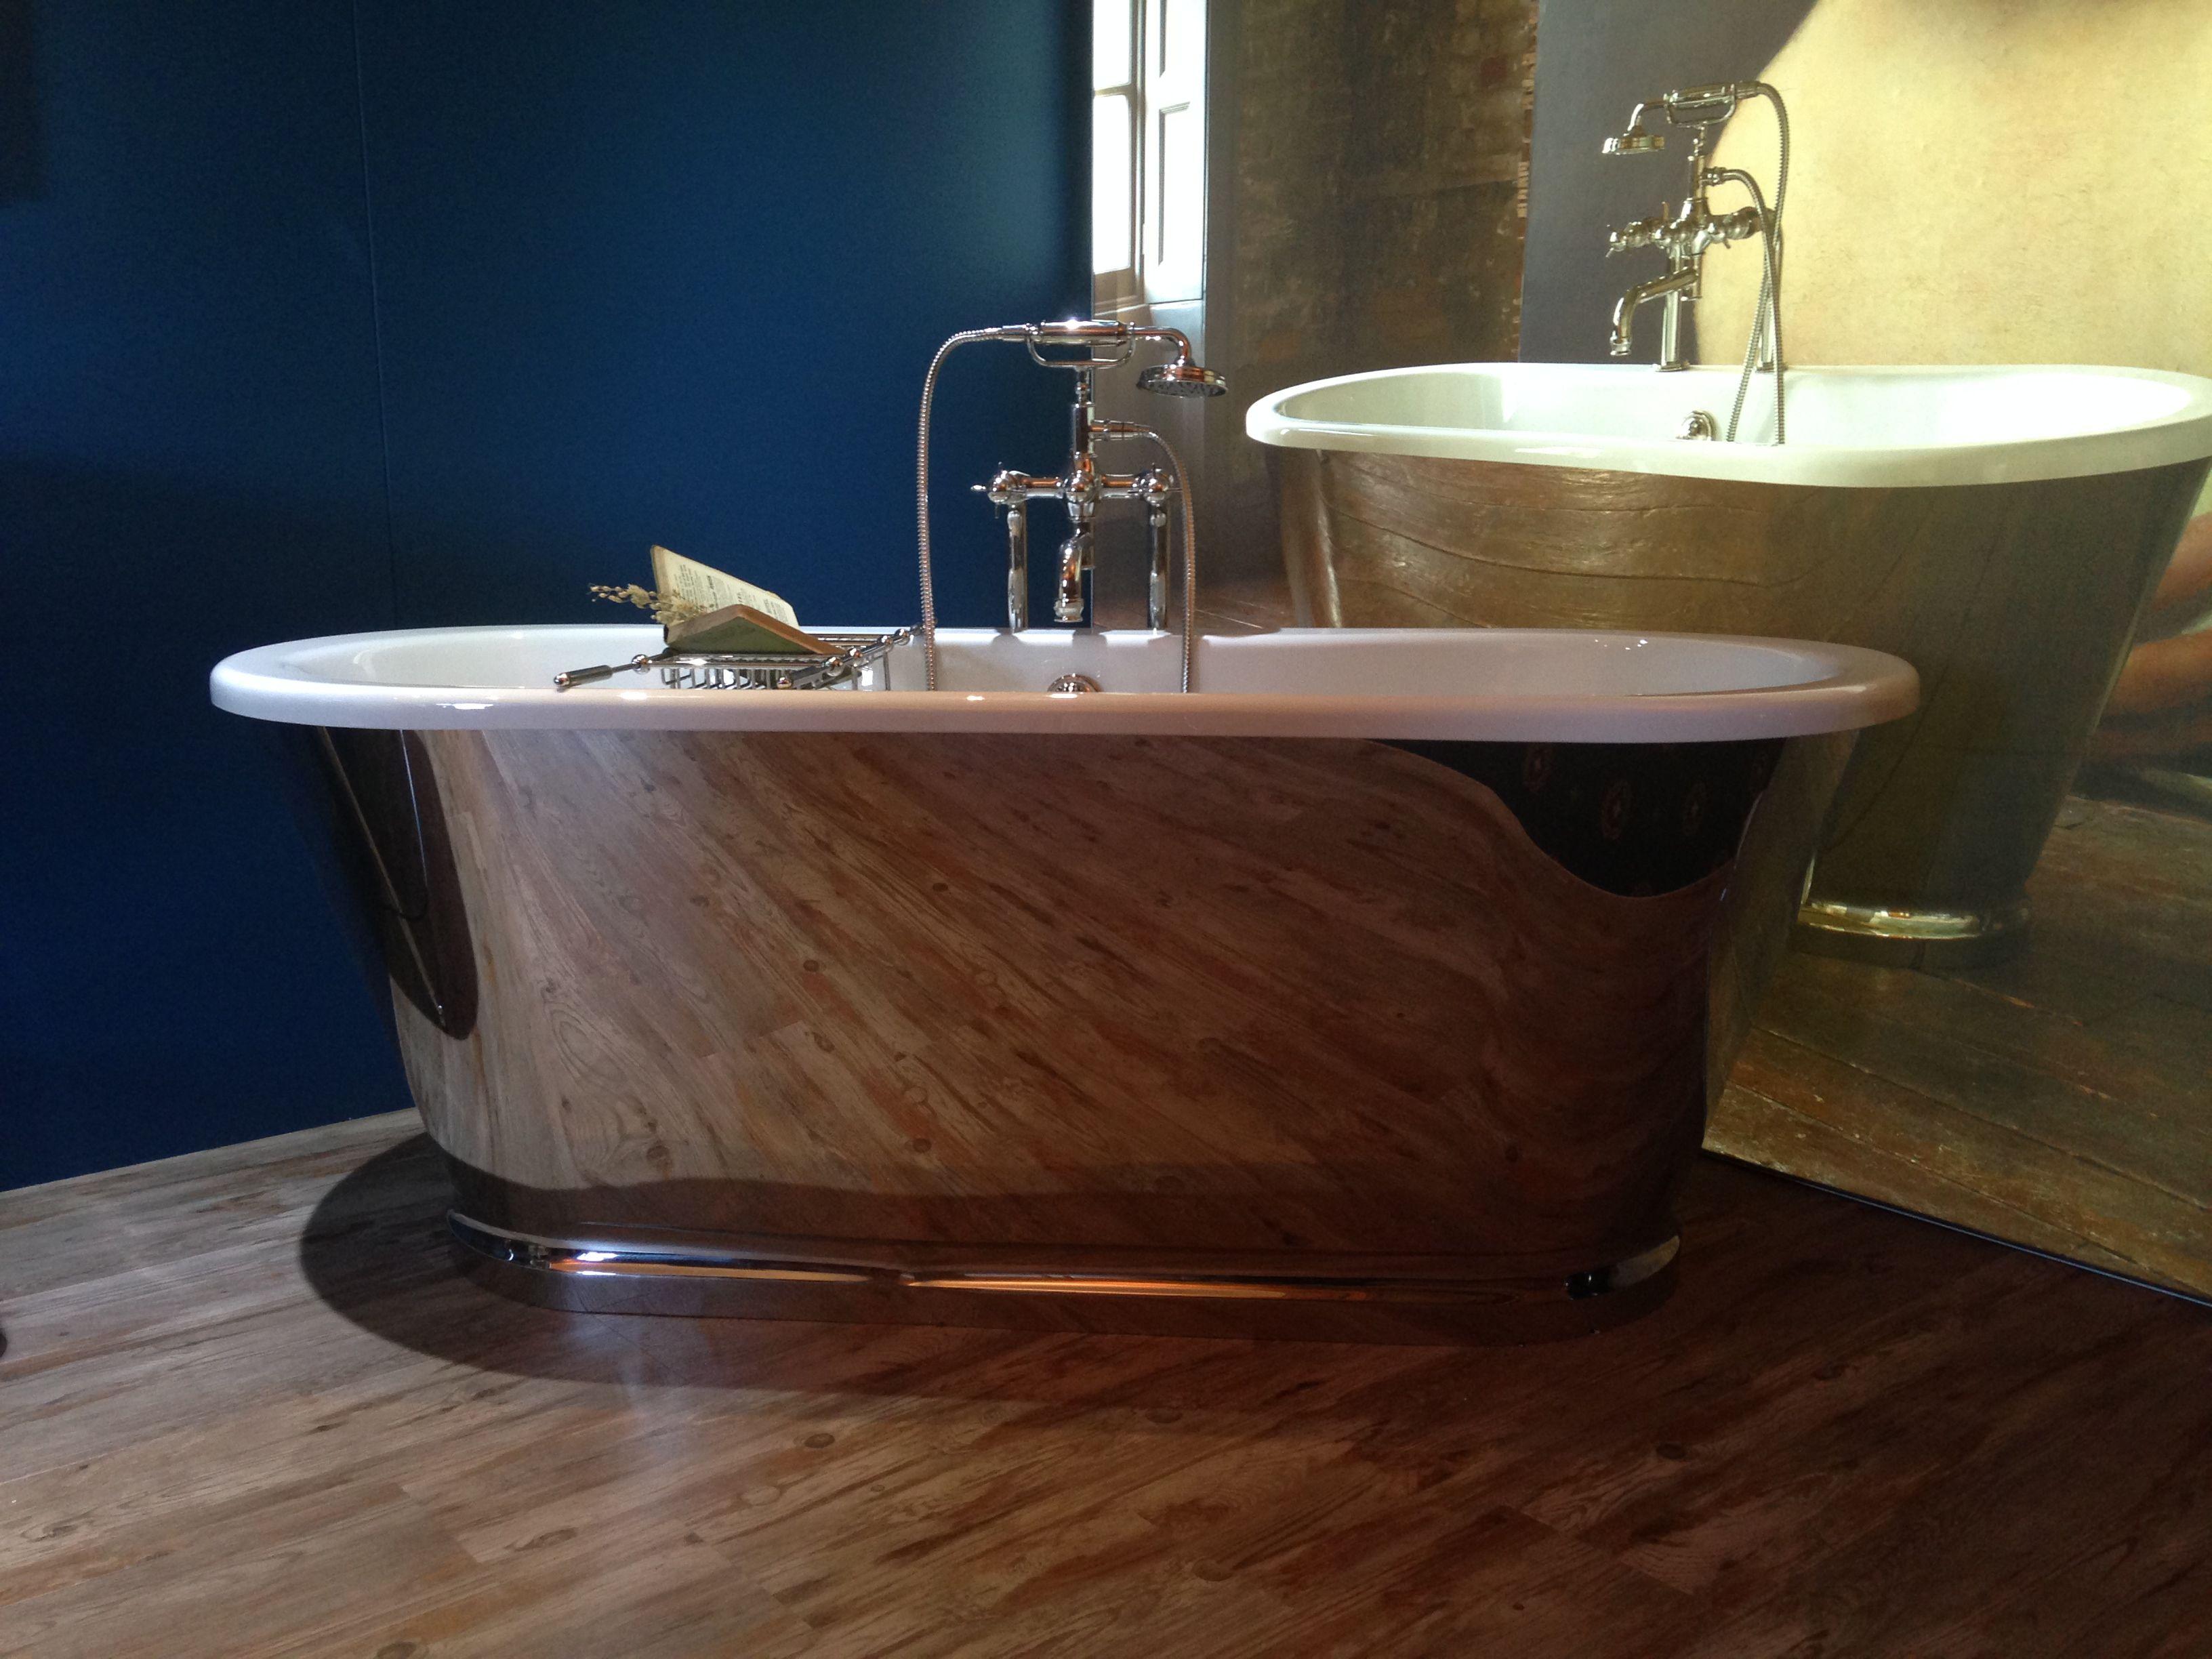 Albermarle freestanding bath with nickel finish stainless steel ...